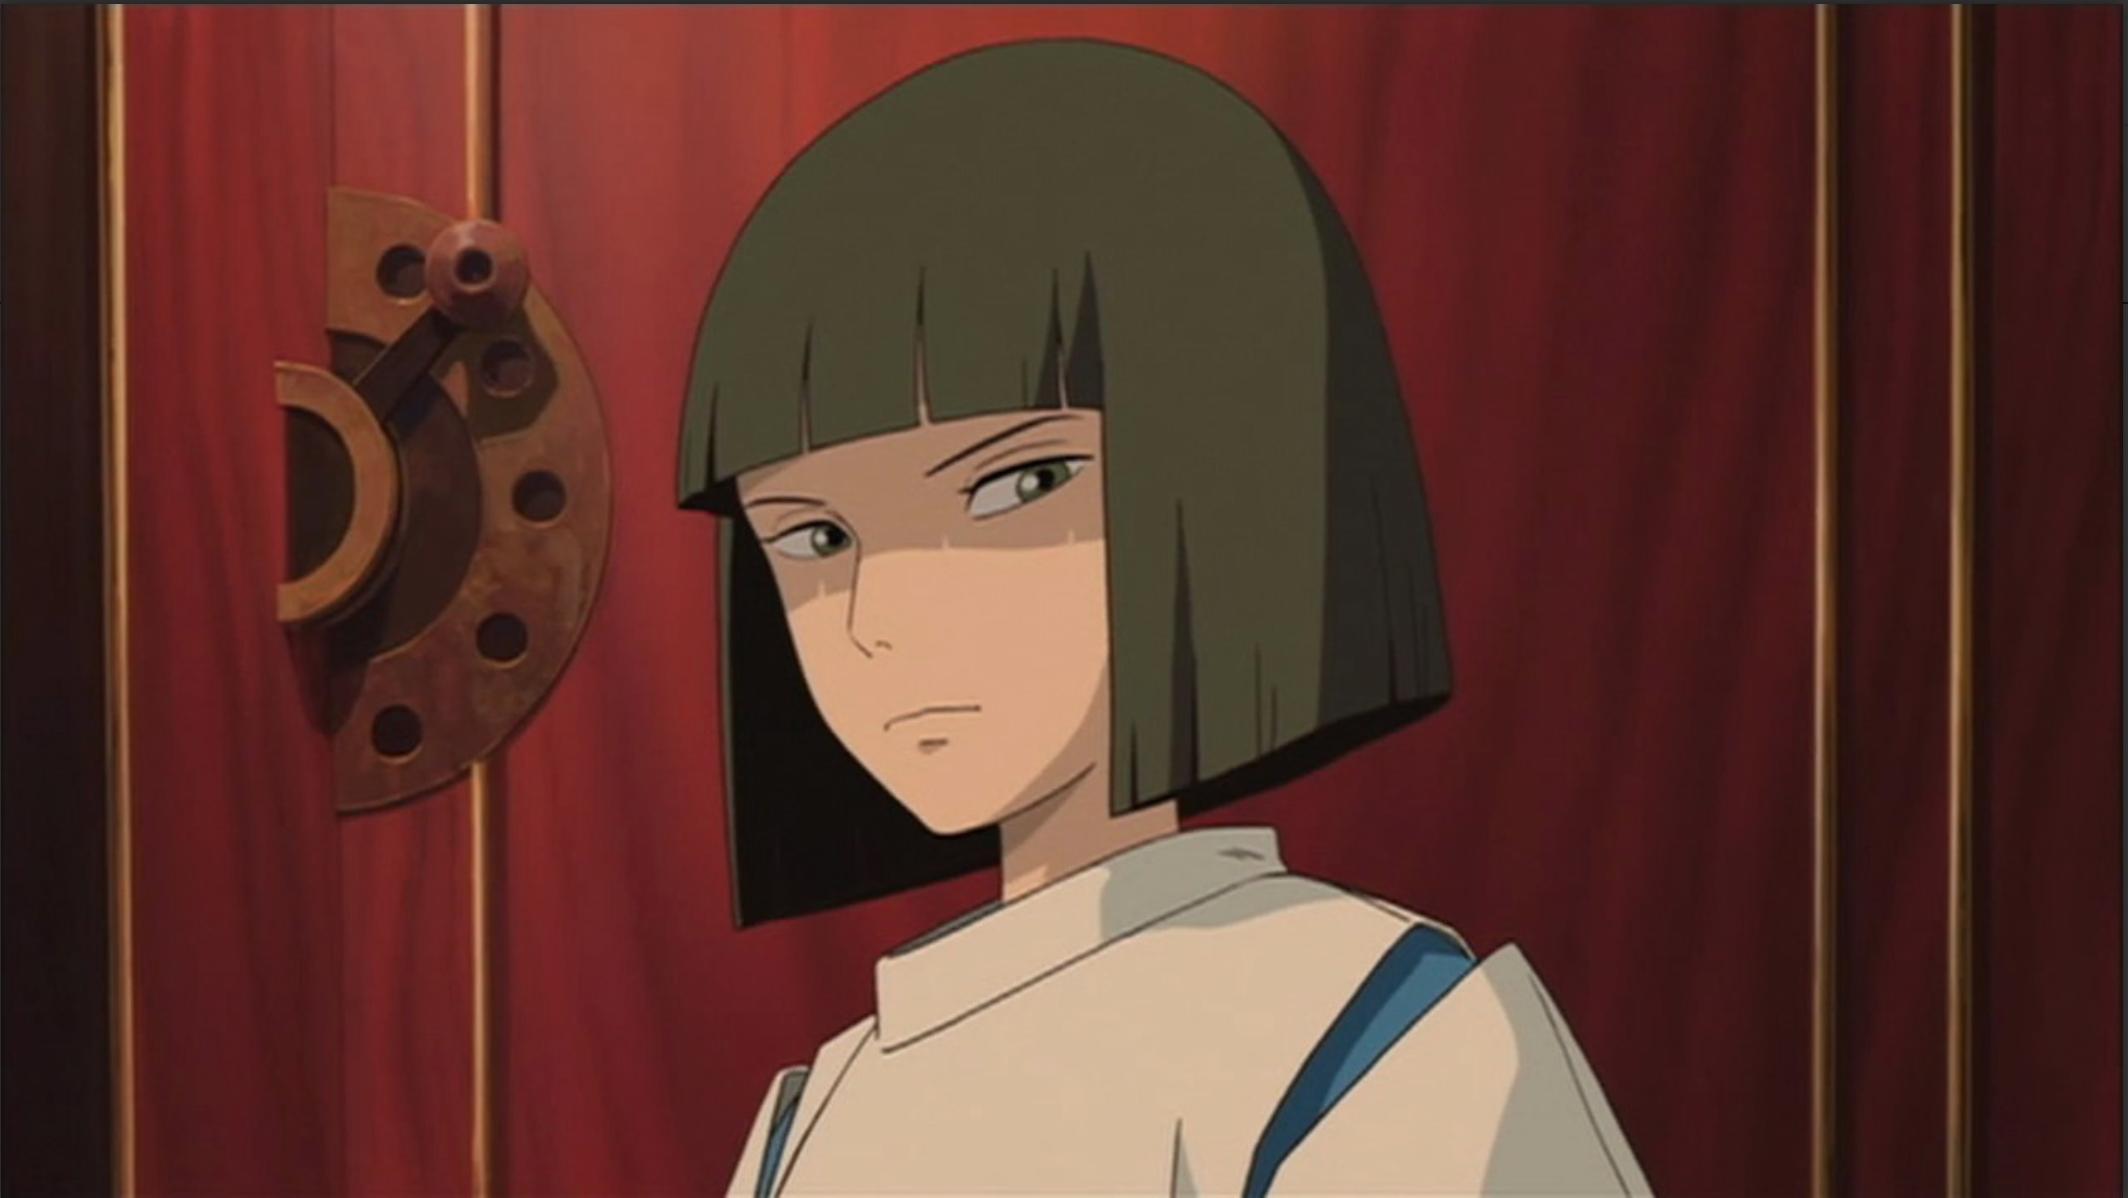 Haku Speaks Sternly To Chihiro In The Elevator Spirited Away Studio Ghibli Art Studio Ghibli